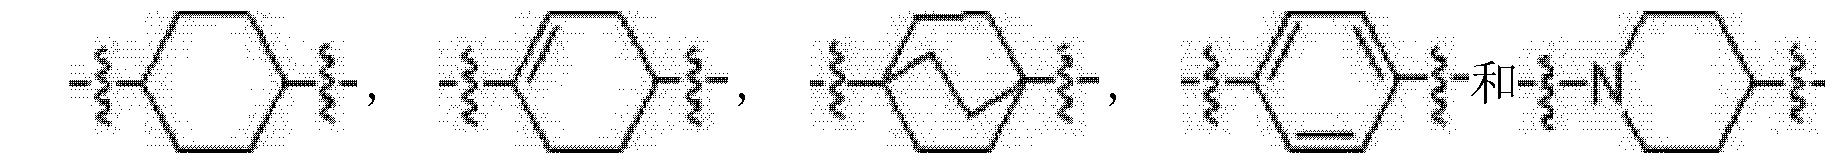 Figure CN102378762AD00162